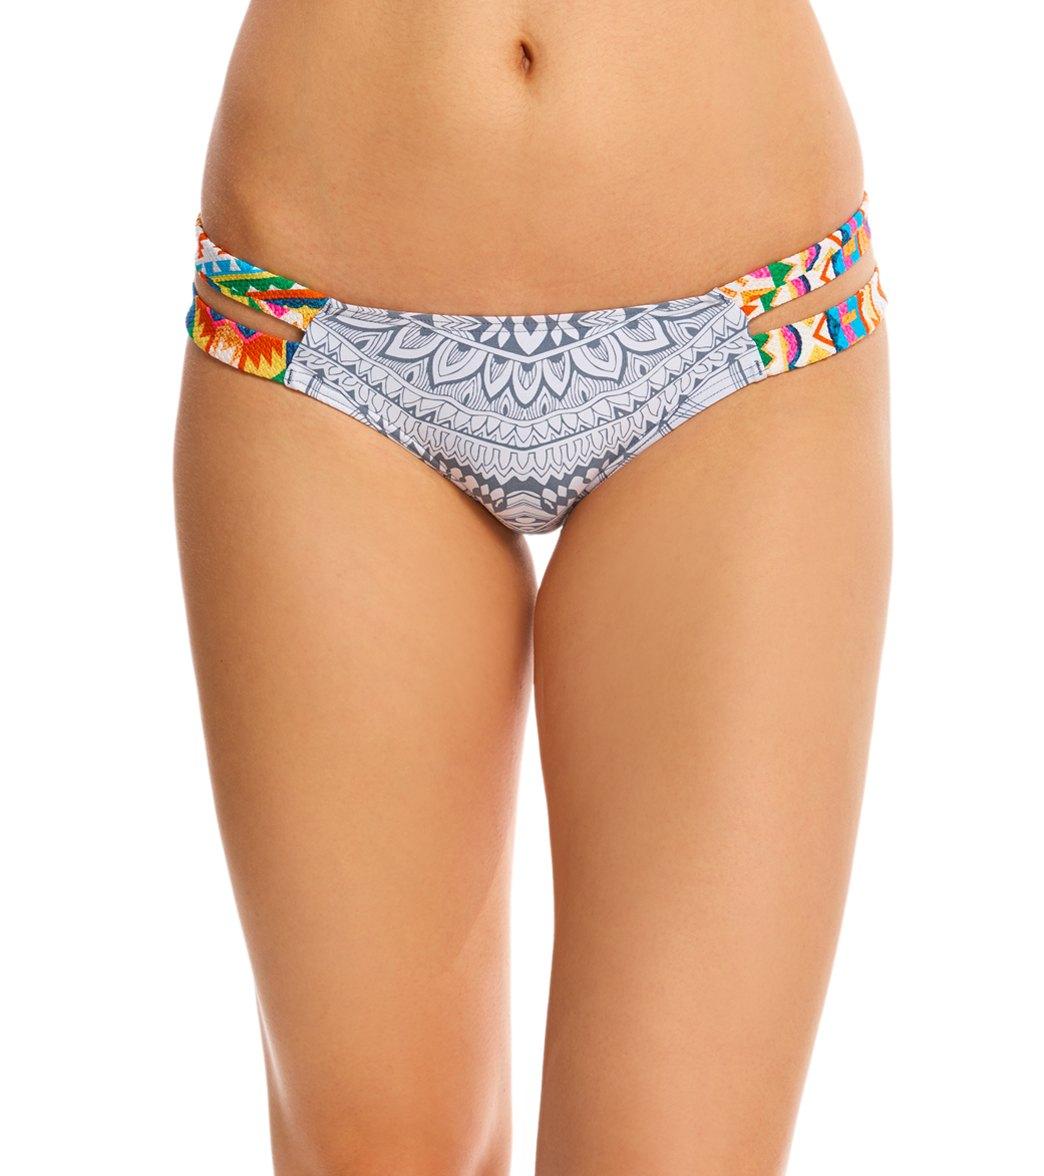 079764b658 ... Rip Curl Swimwear Mayan Sun Luxe Hipster Bikini Bottom. Play Video.  MODEL MEASUREMENTS